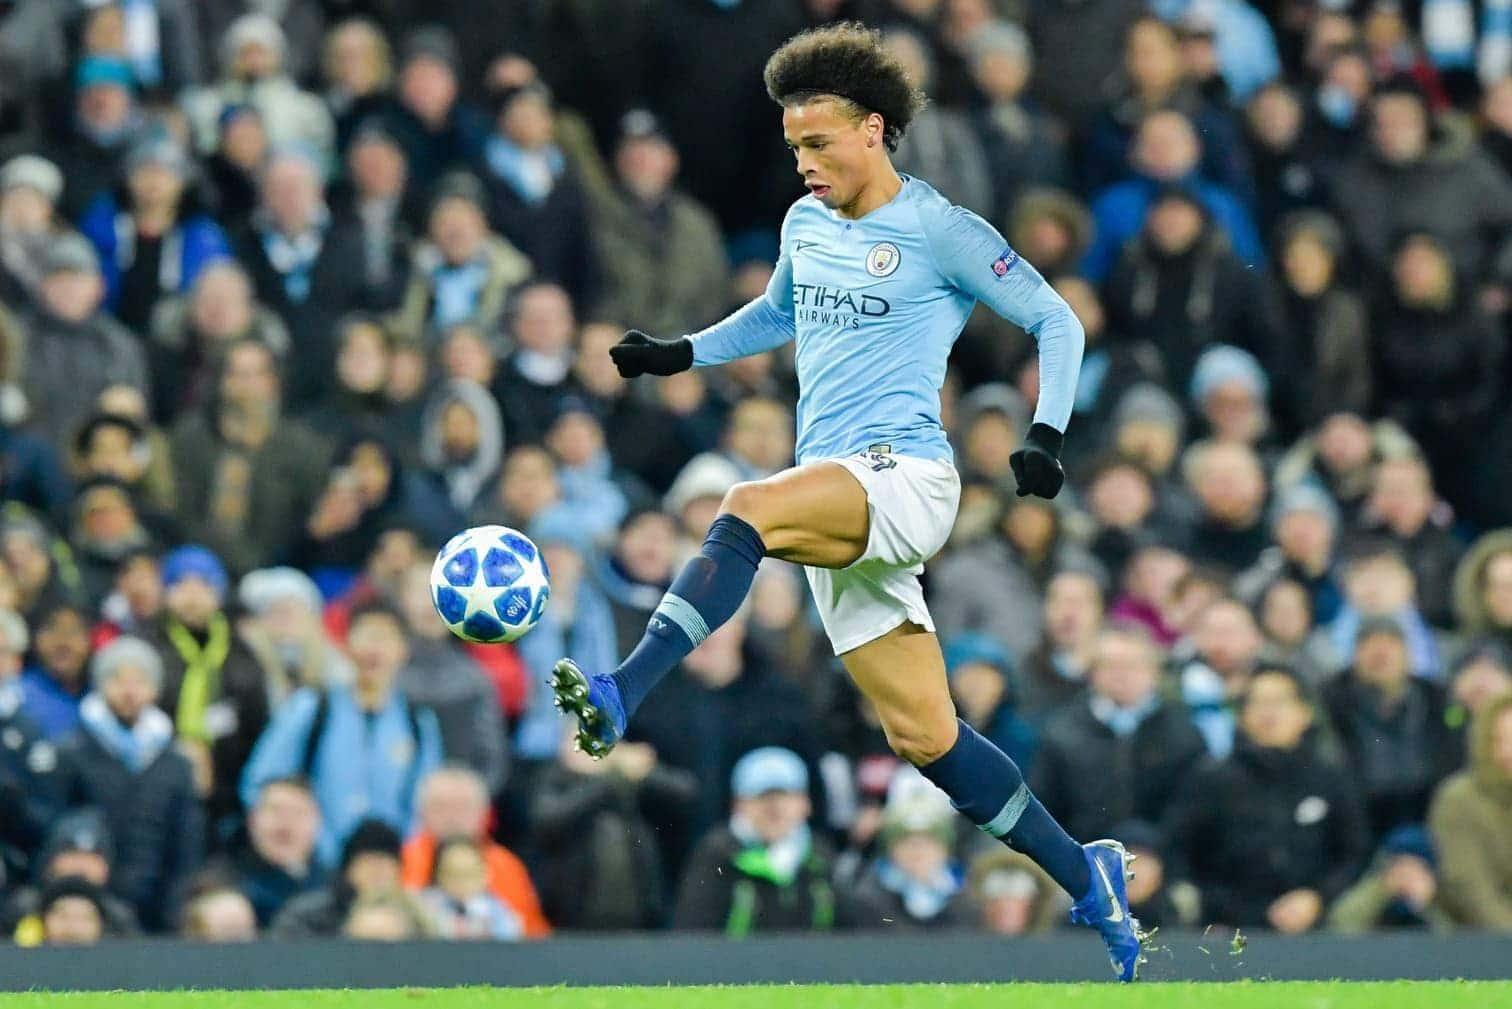 Leroy Sane FC Schalke 04 Manchester City